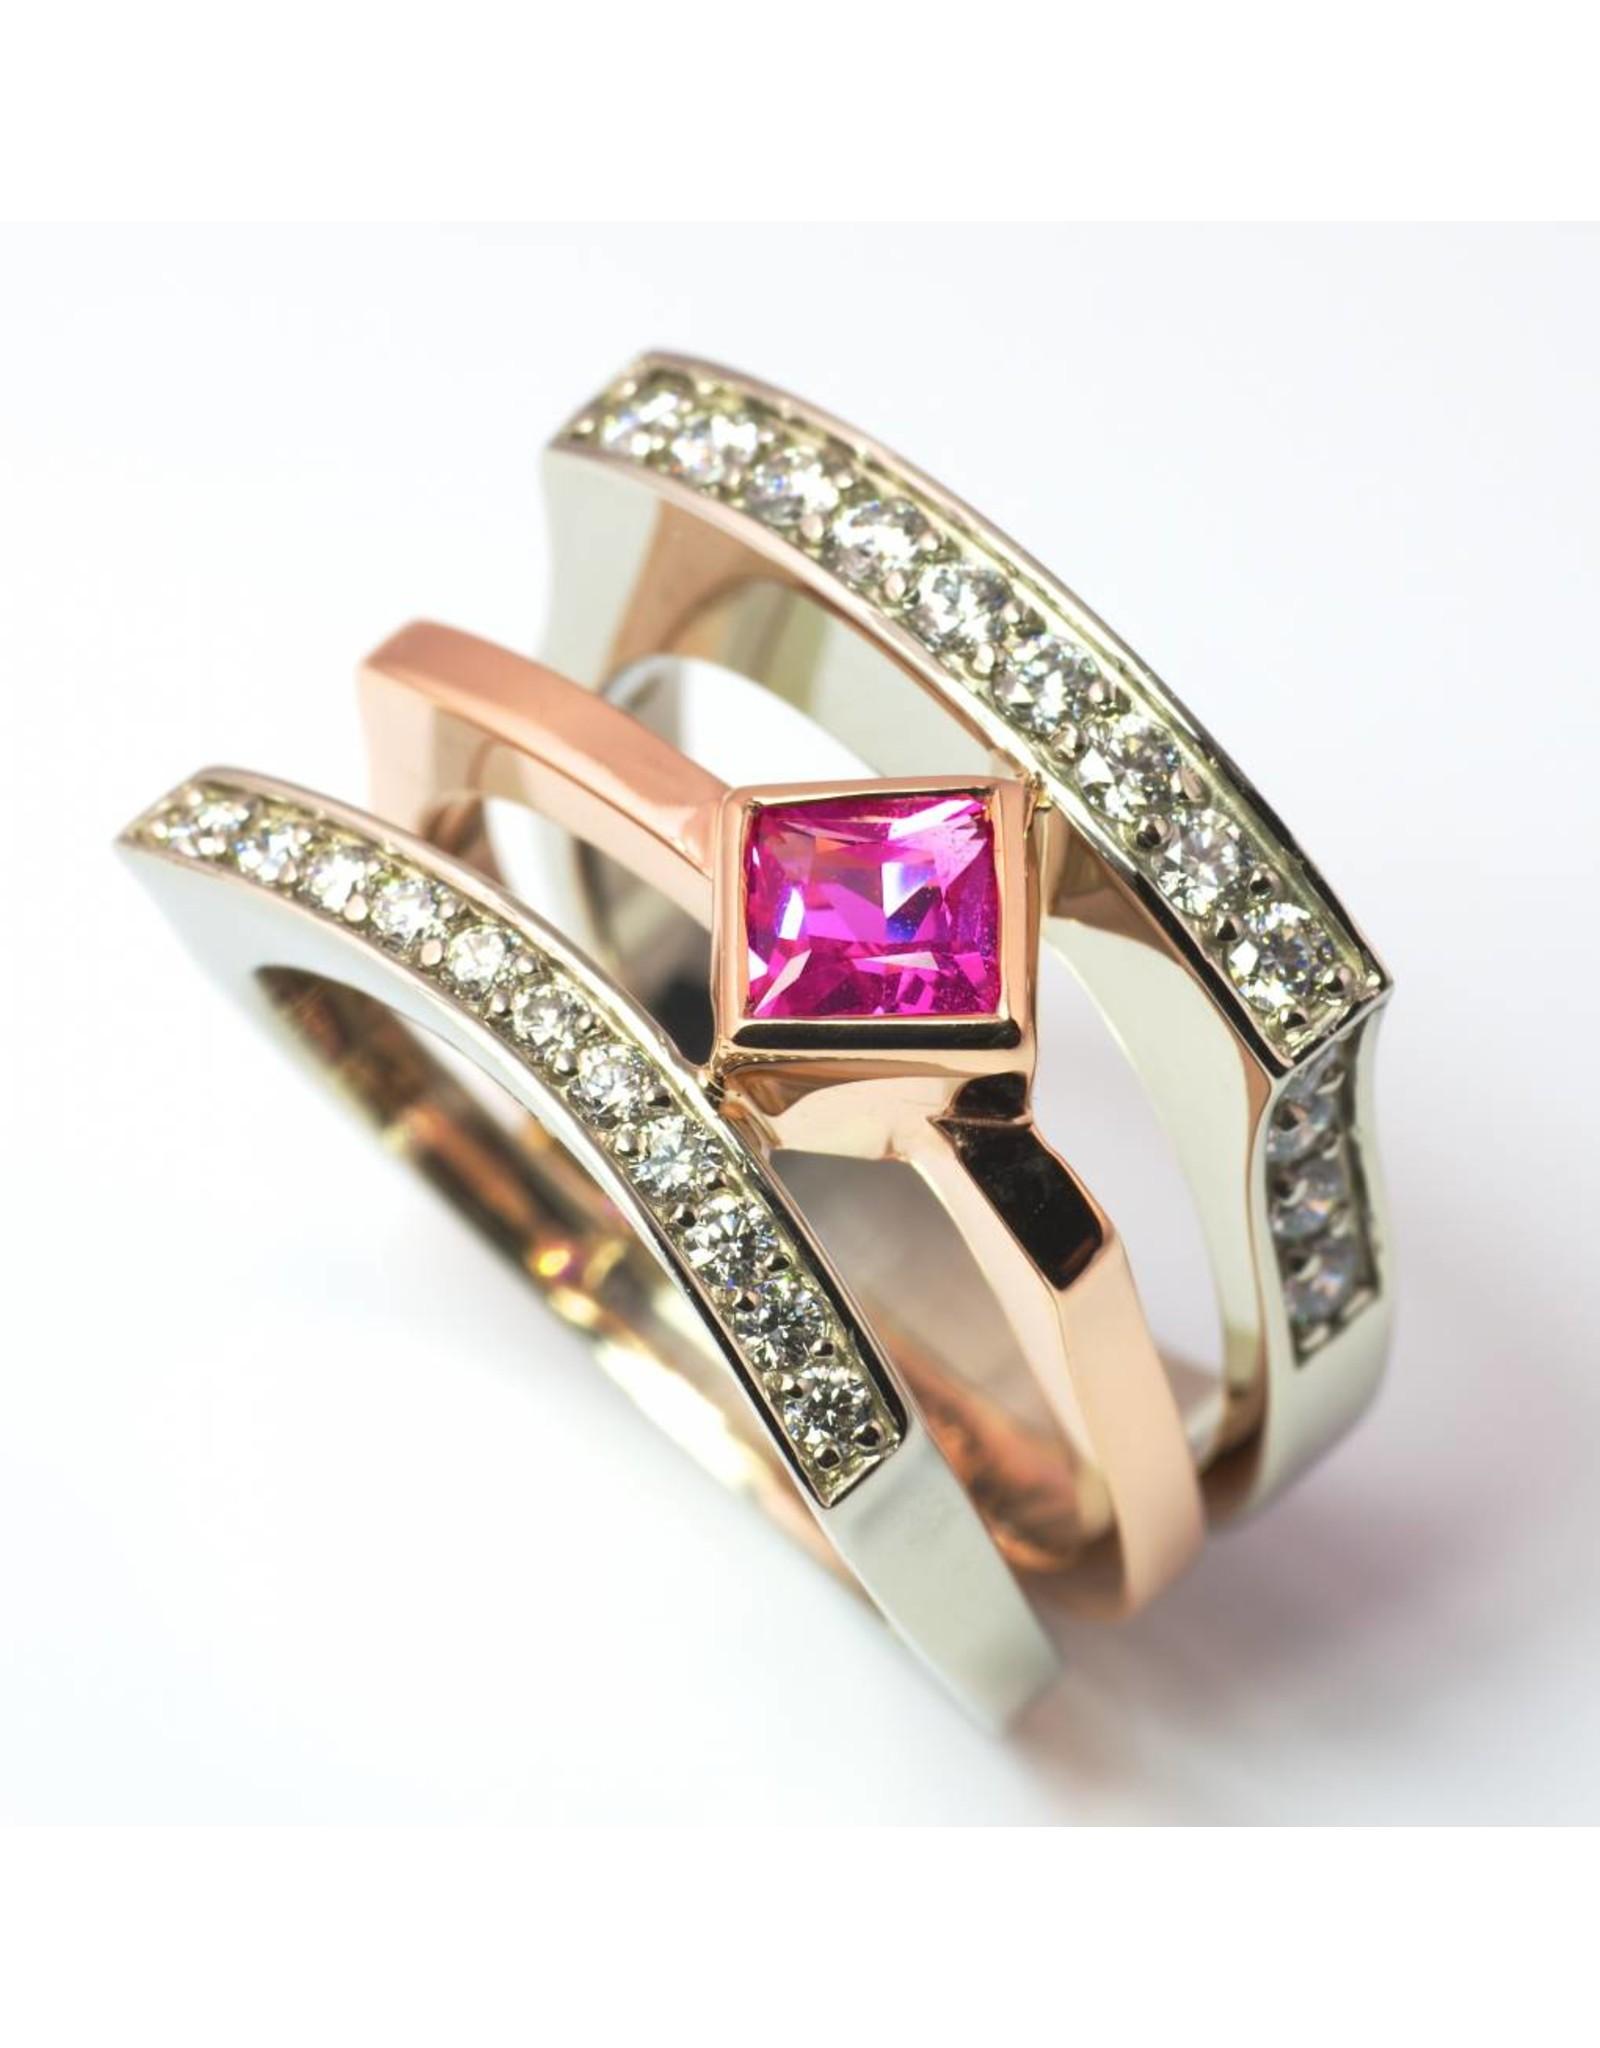 Pink Sapphire & Diamond Ring 14KWR Gold